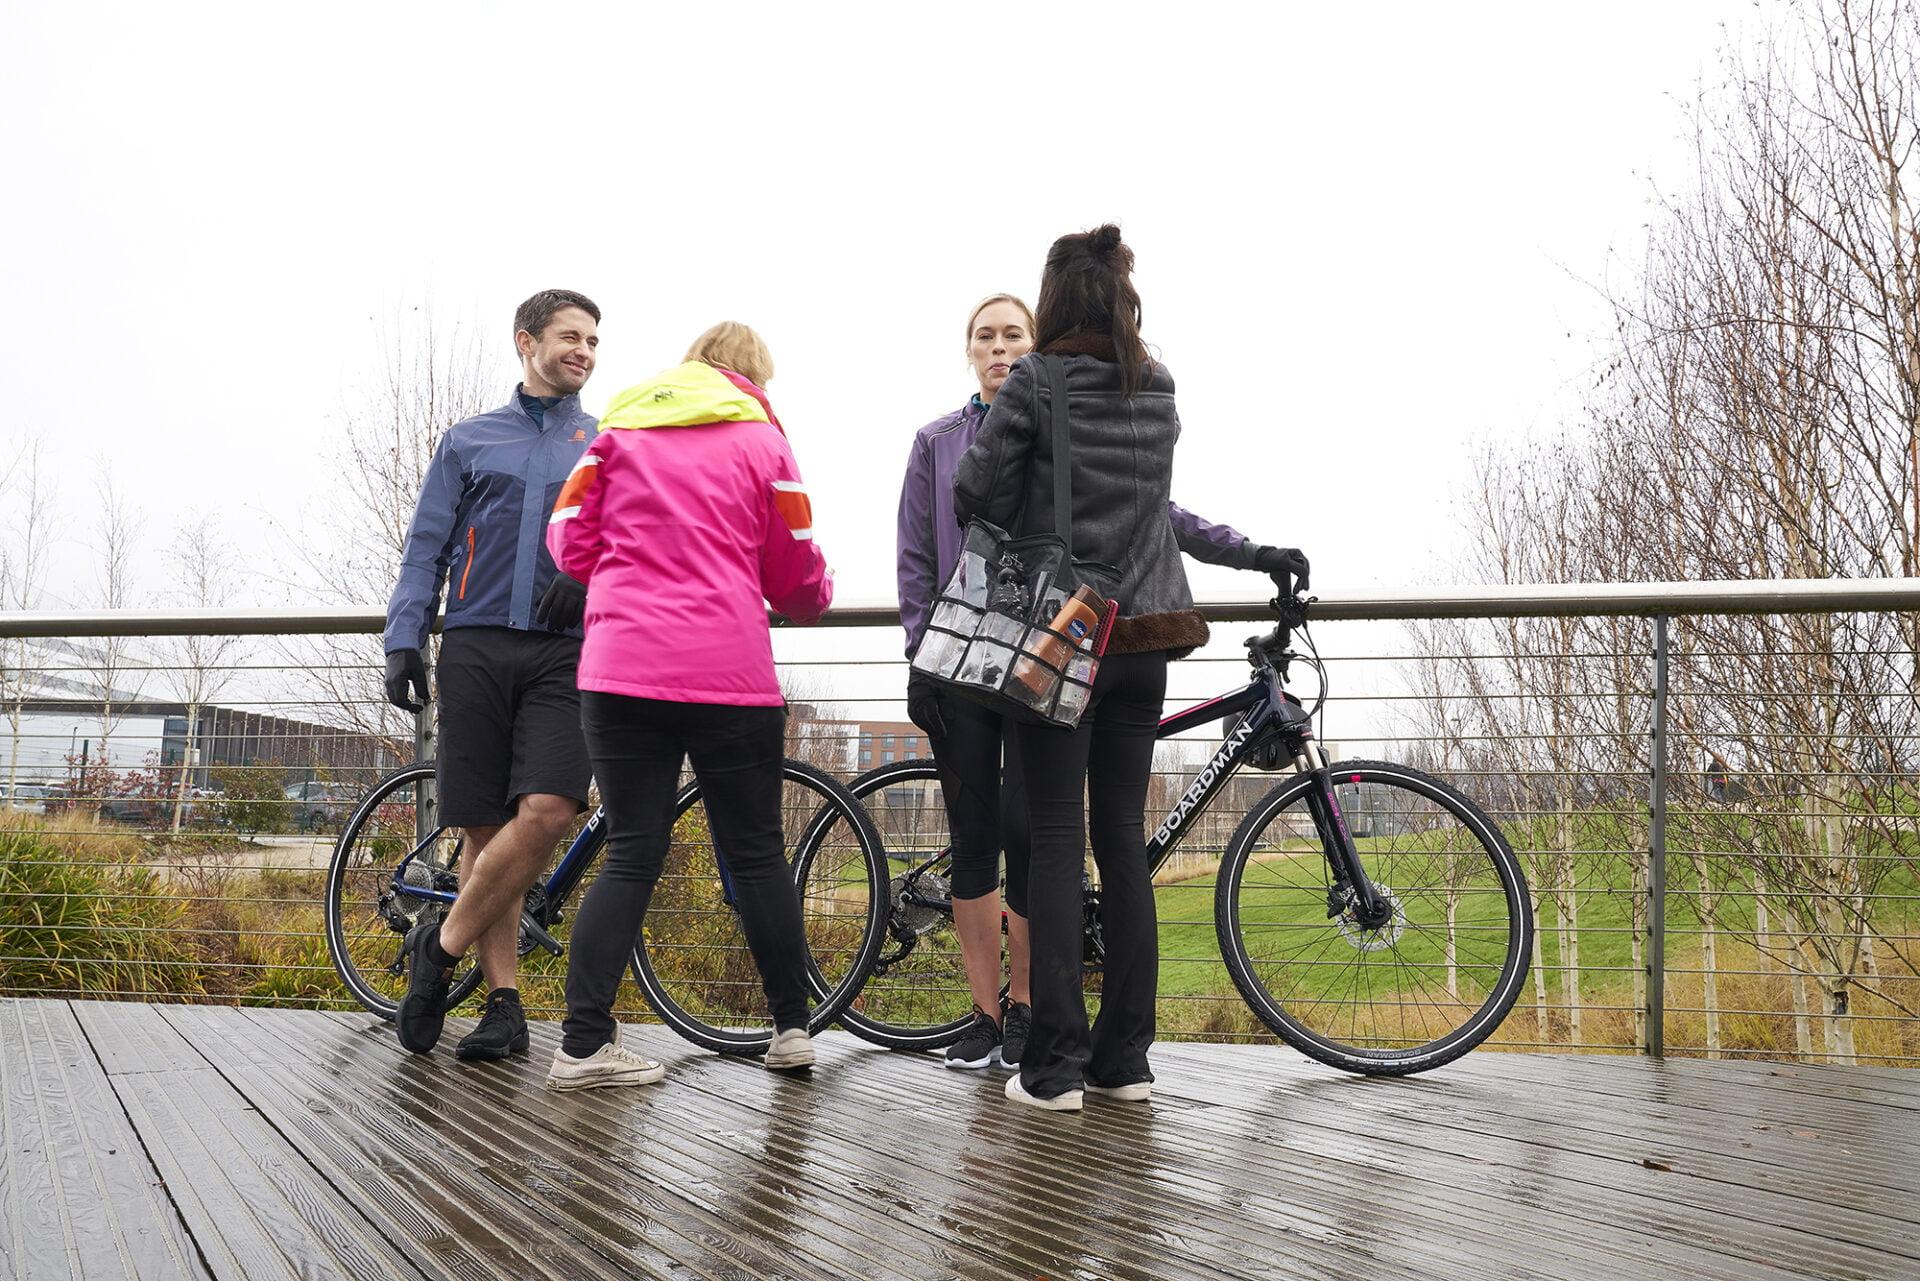 lifestyle photography Birmingham West Midlands cycling clothing